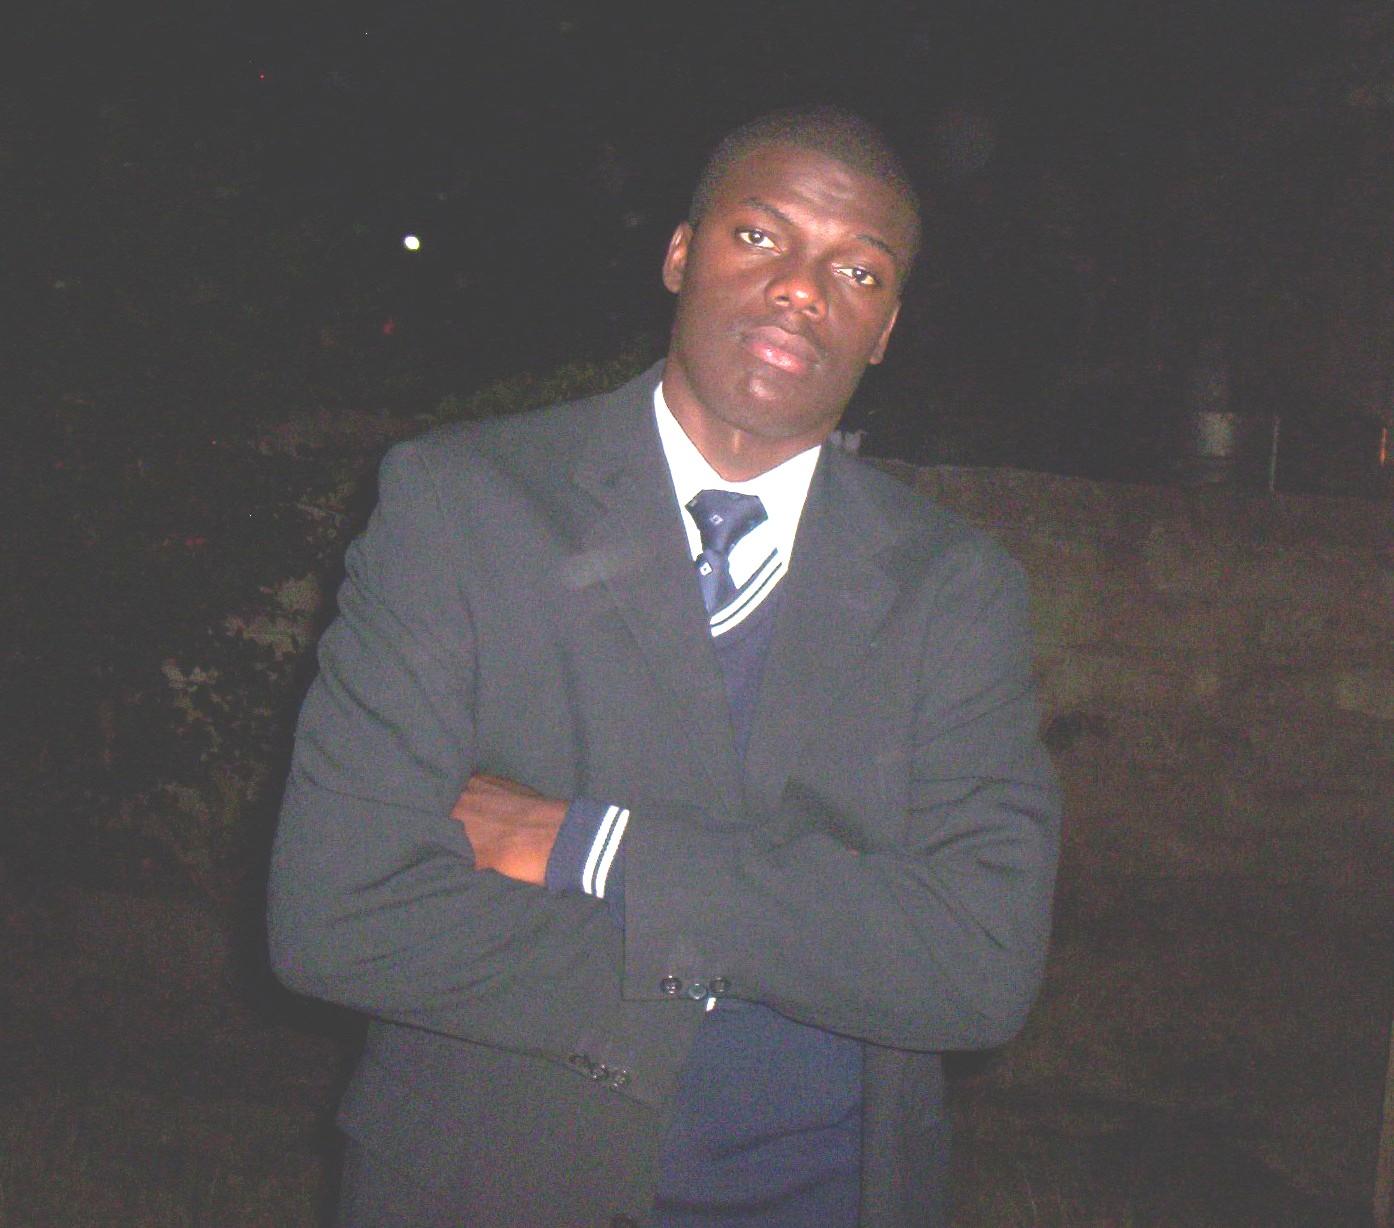 Esau, Male African Sperm Donor From Nairobi in Kenya